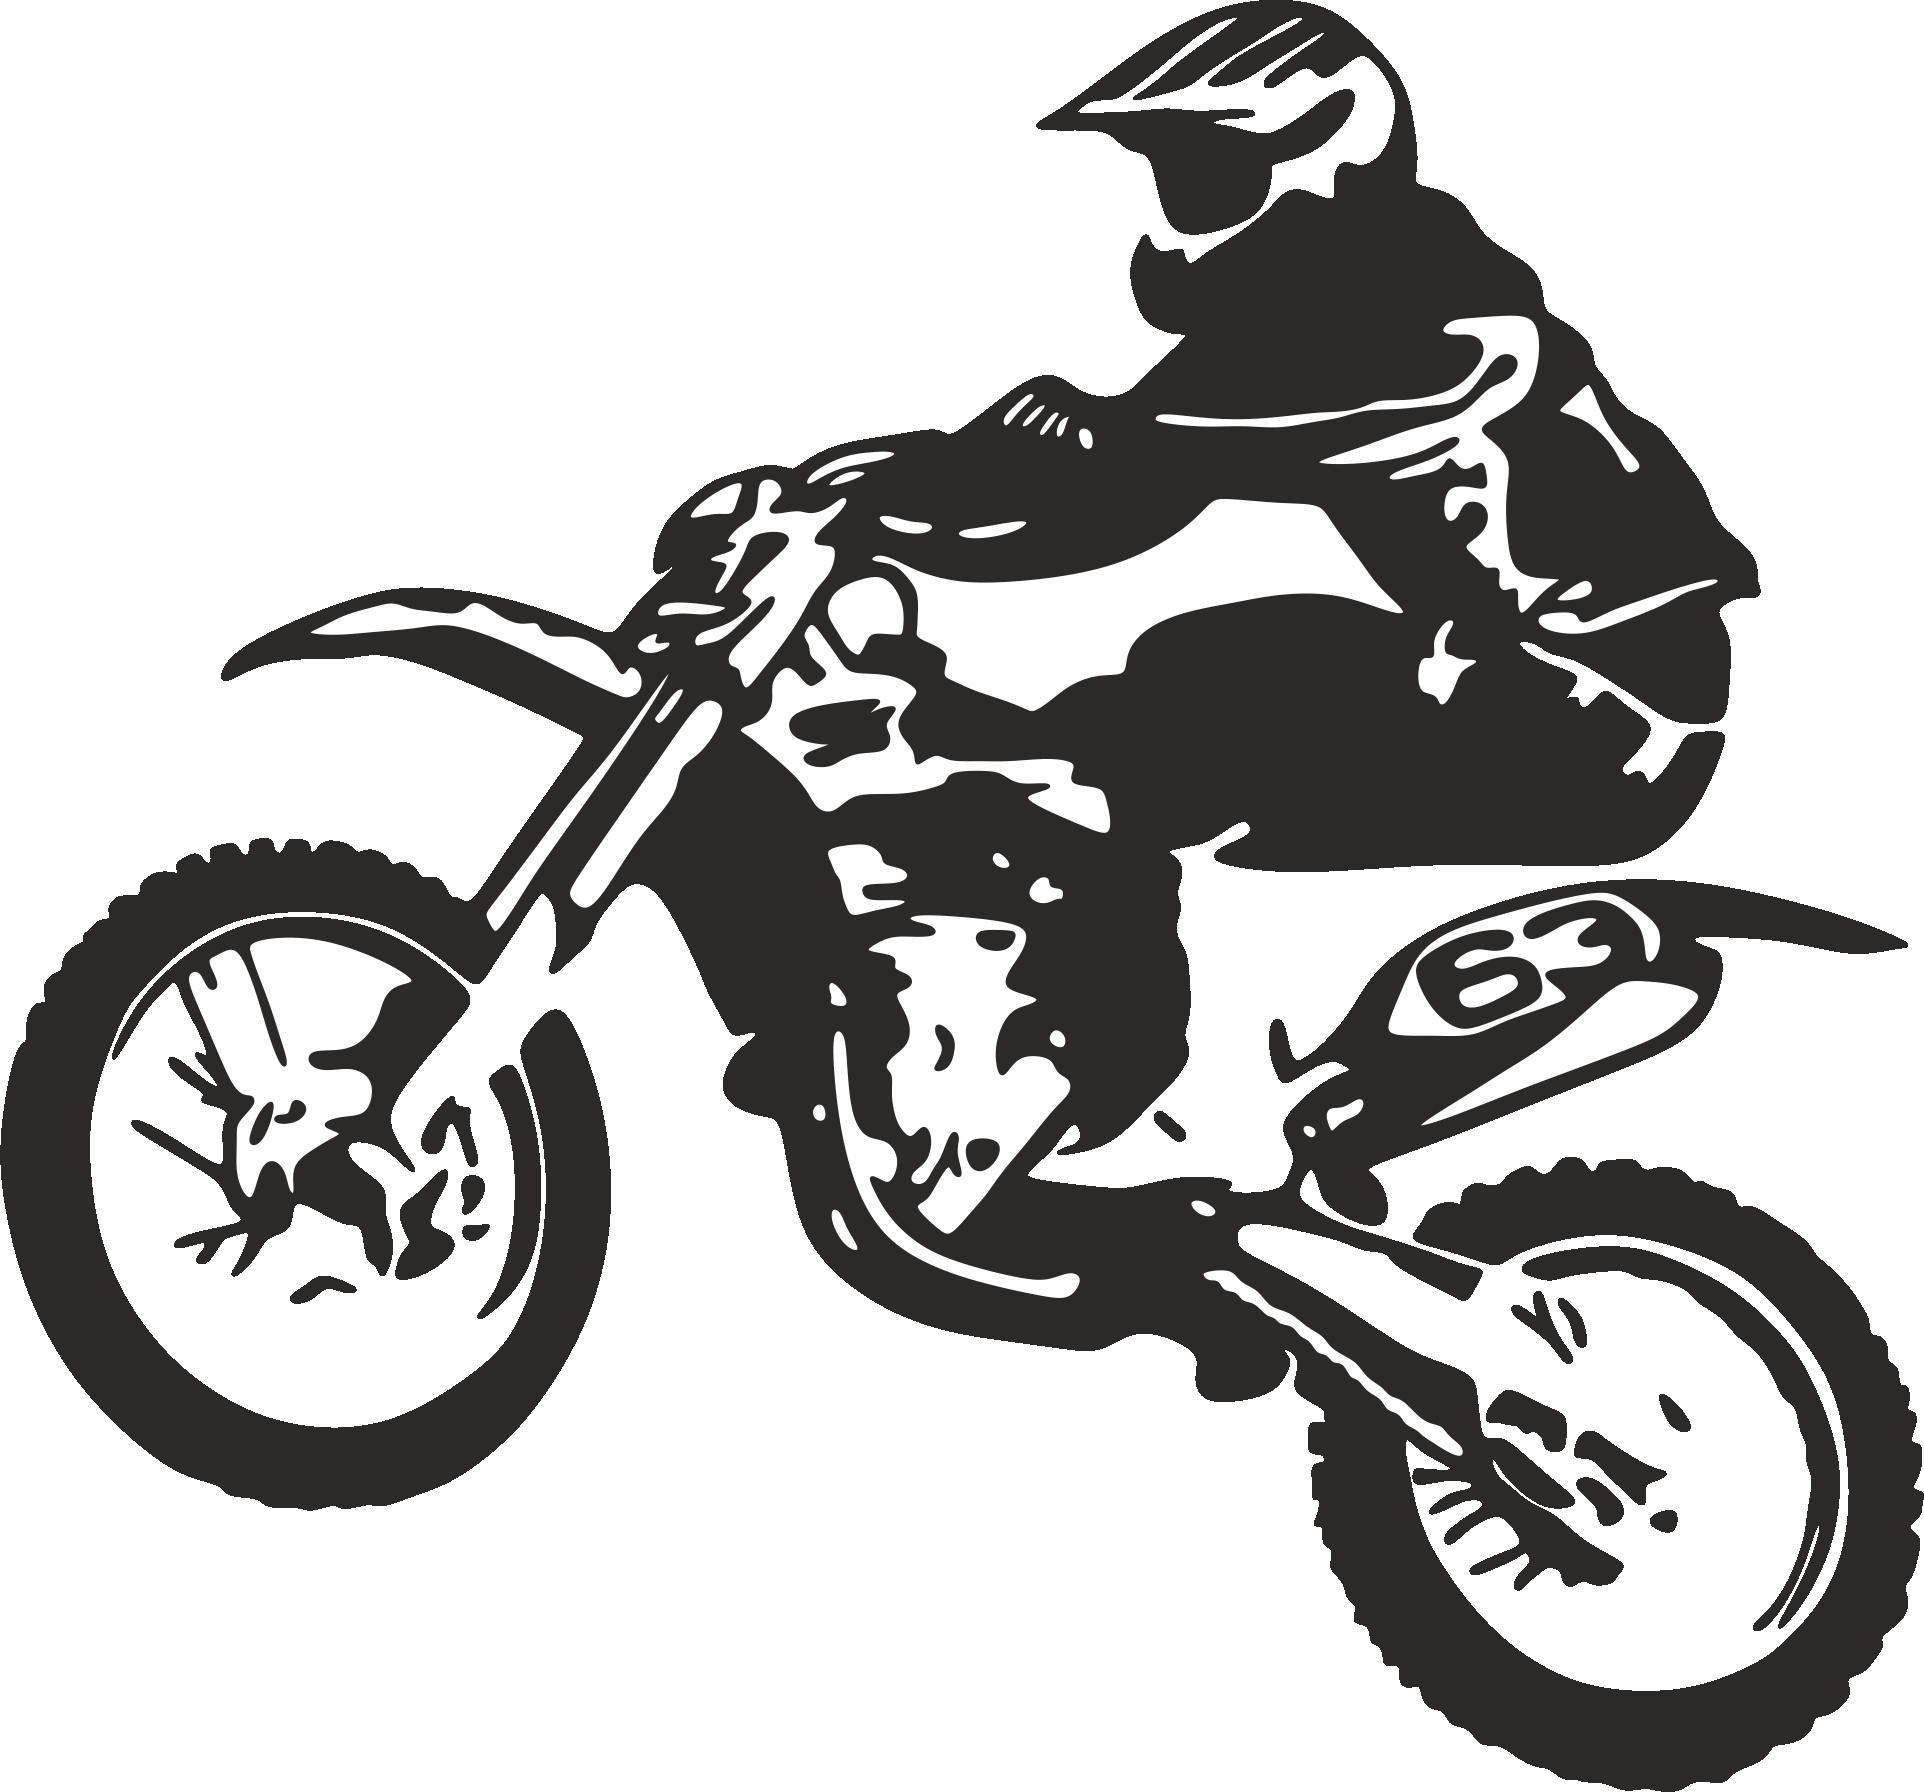 Clip art Bicycle Motorcycle Dirt Bike Motocross.